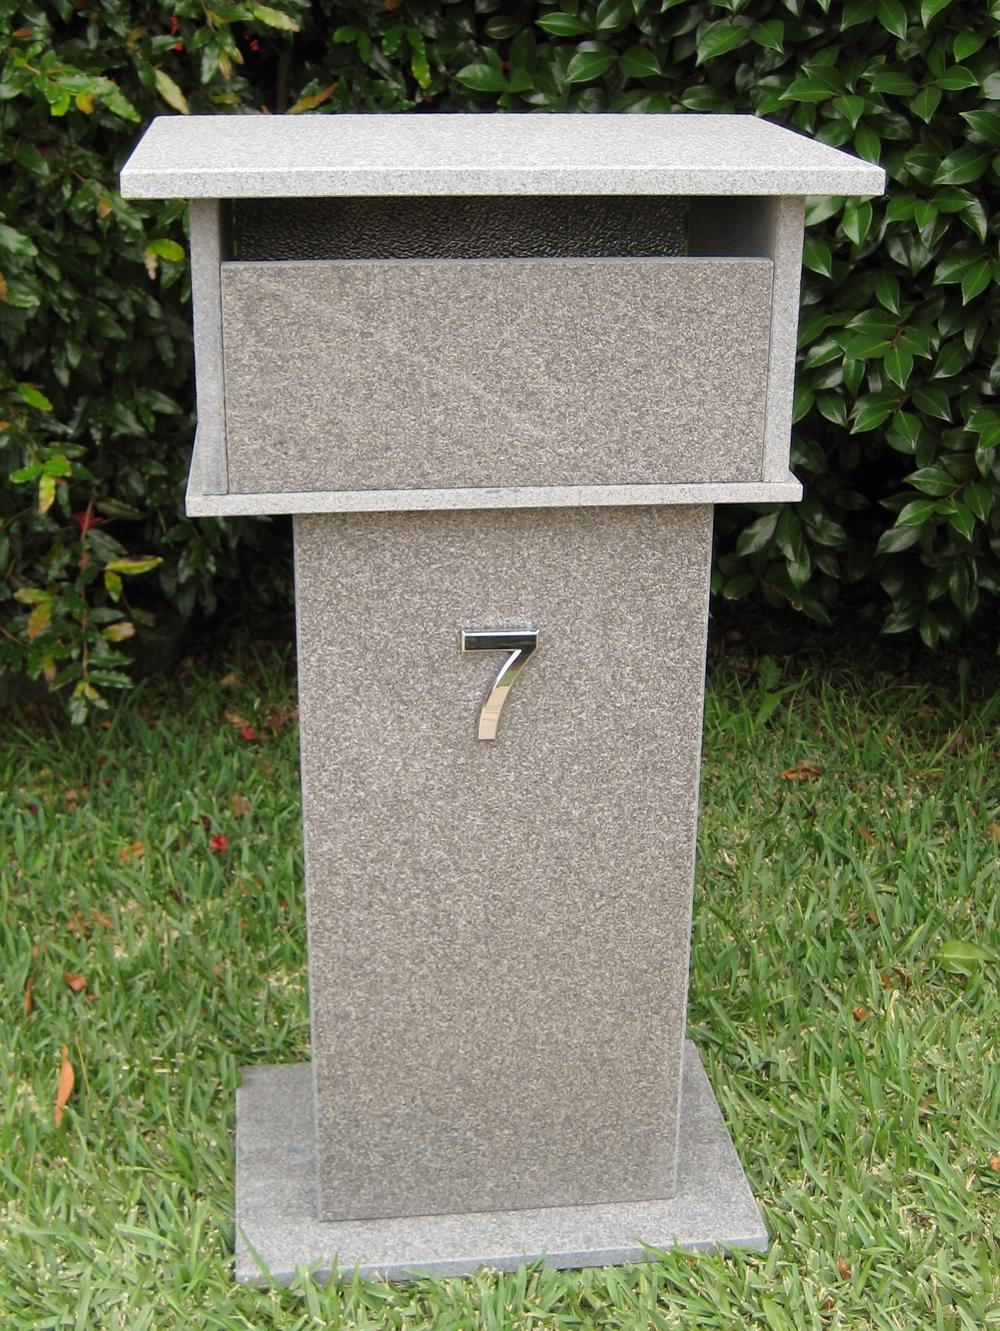 70. Blue stone letterbox with bushhammered finish. Back 2 key aluminium door. Tough material. Sizes 820x400x300 $430